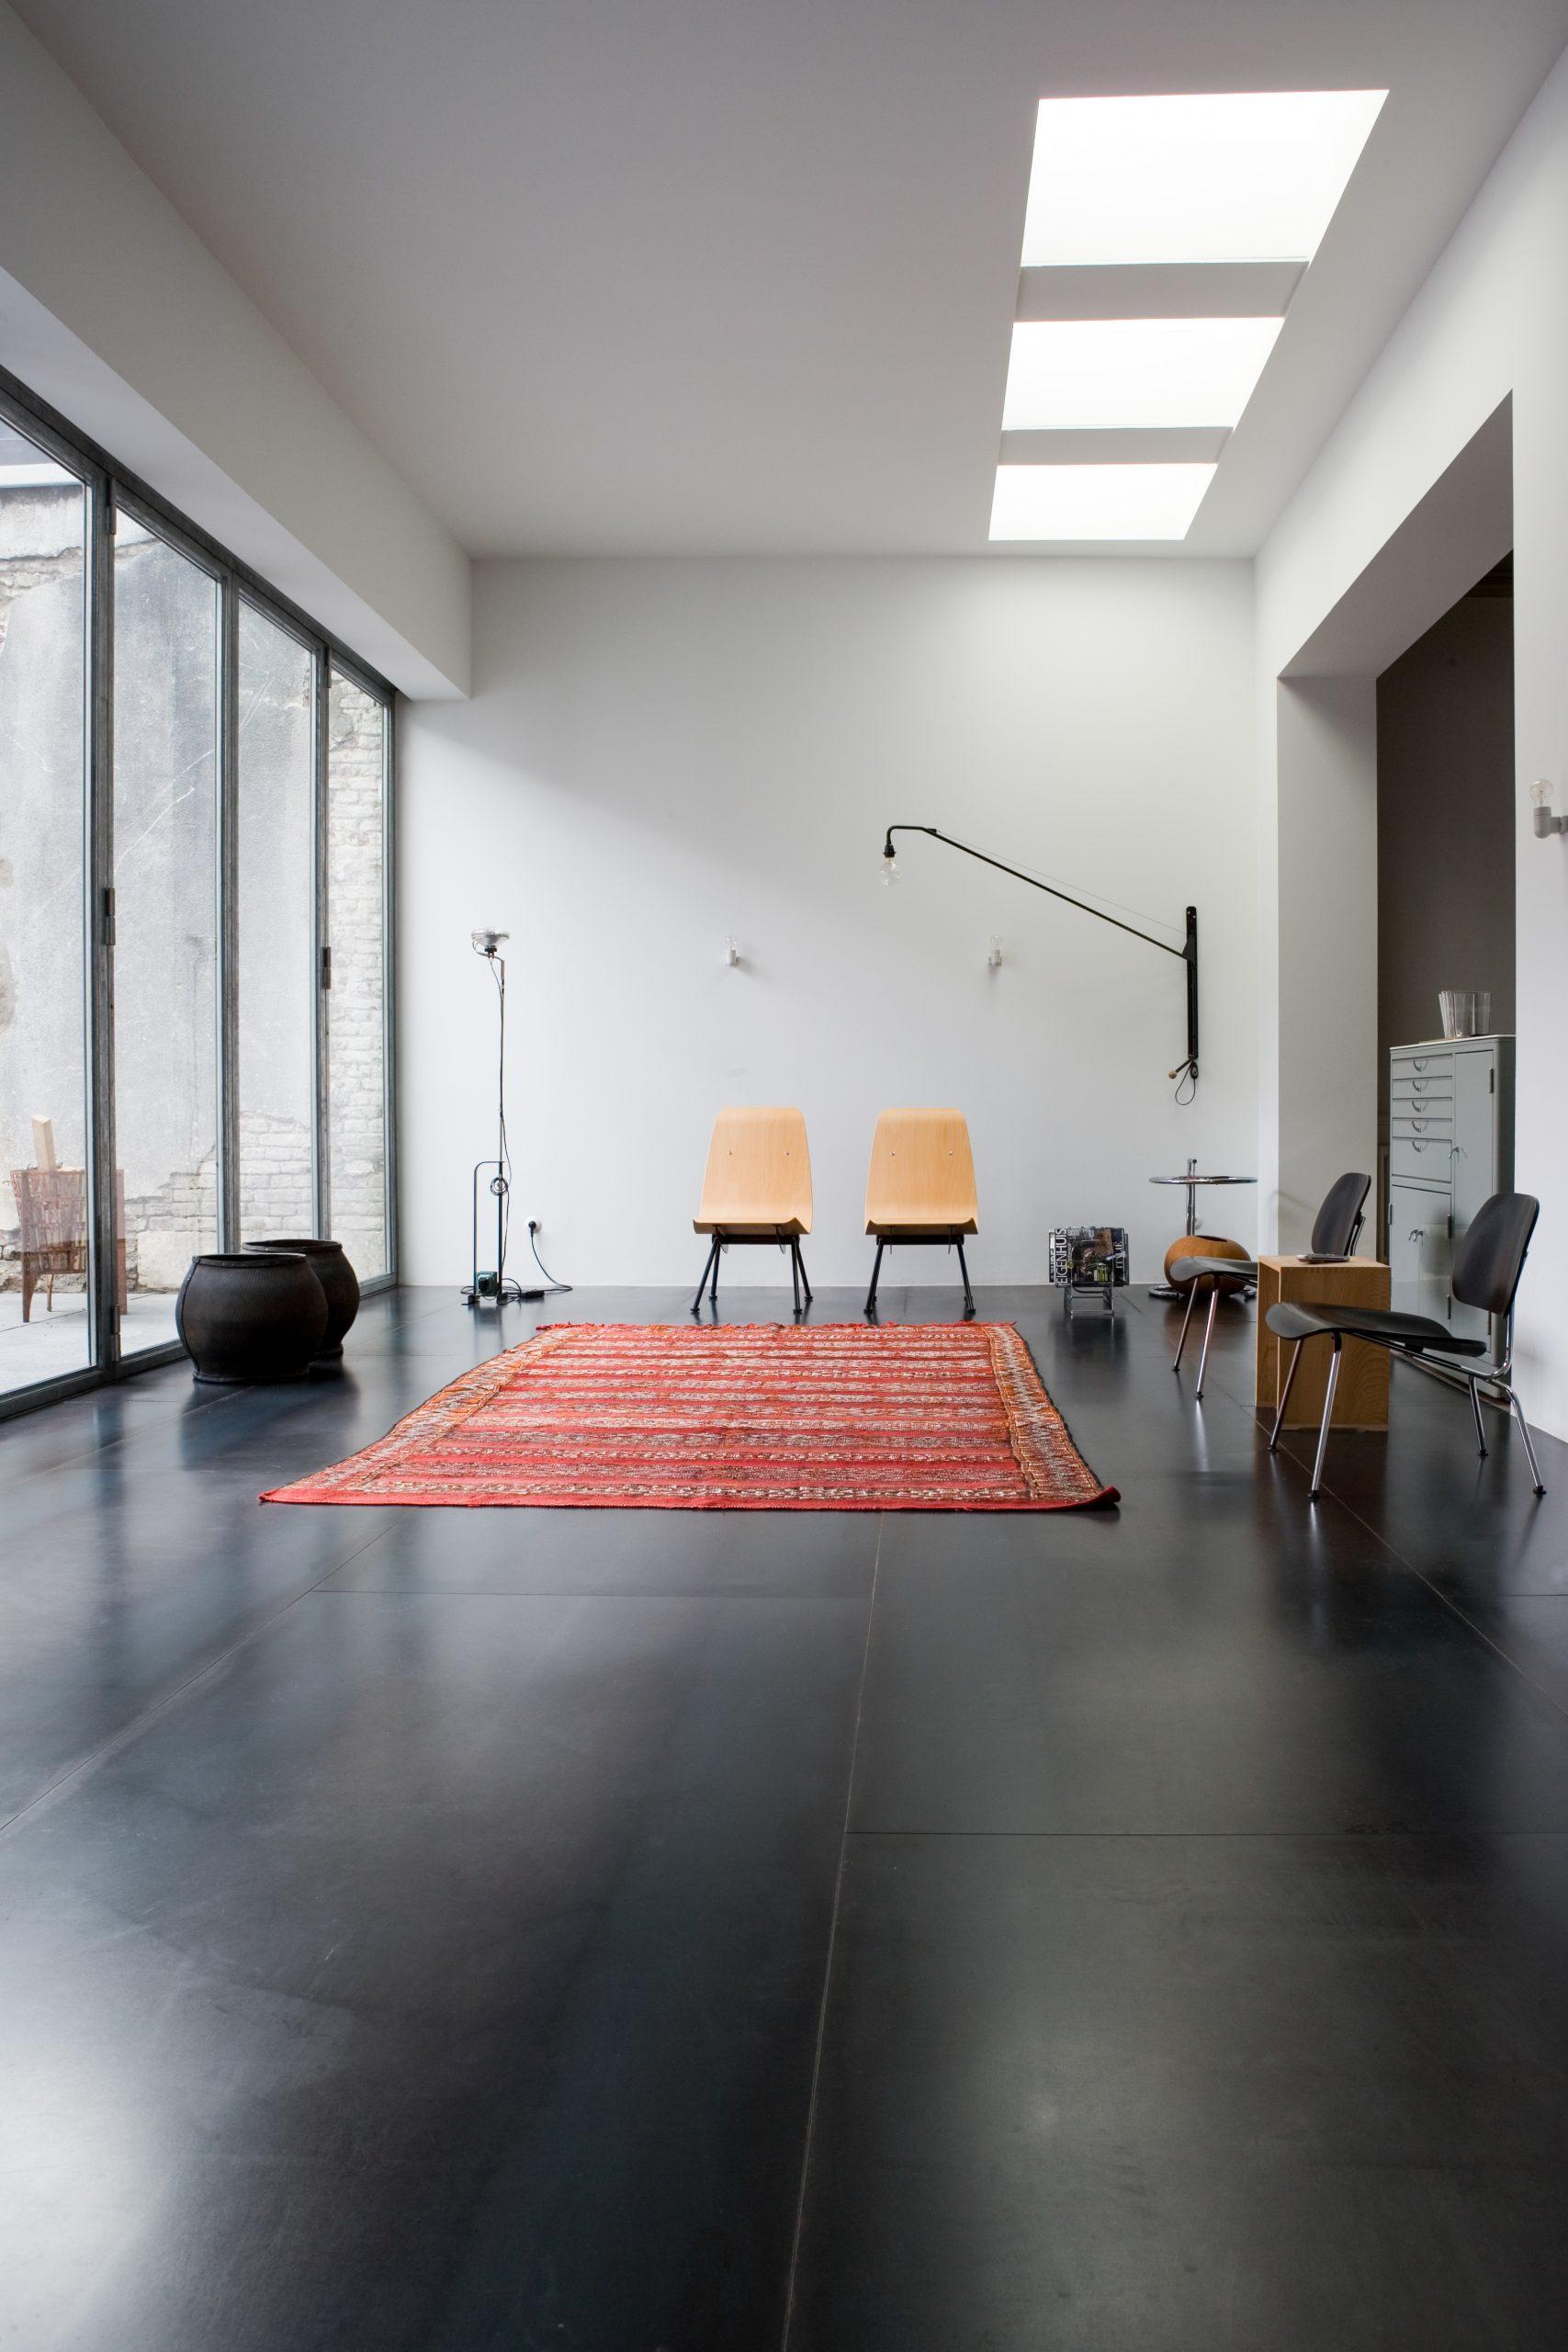 Rewriting history minimalistic room